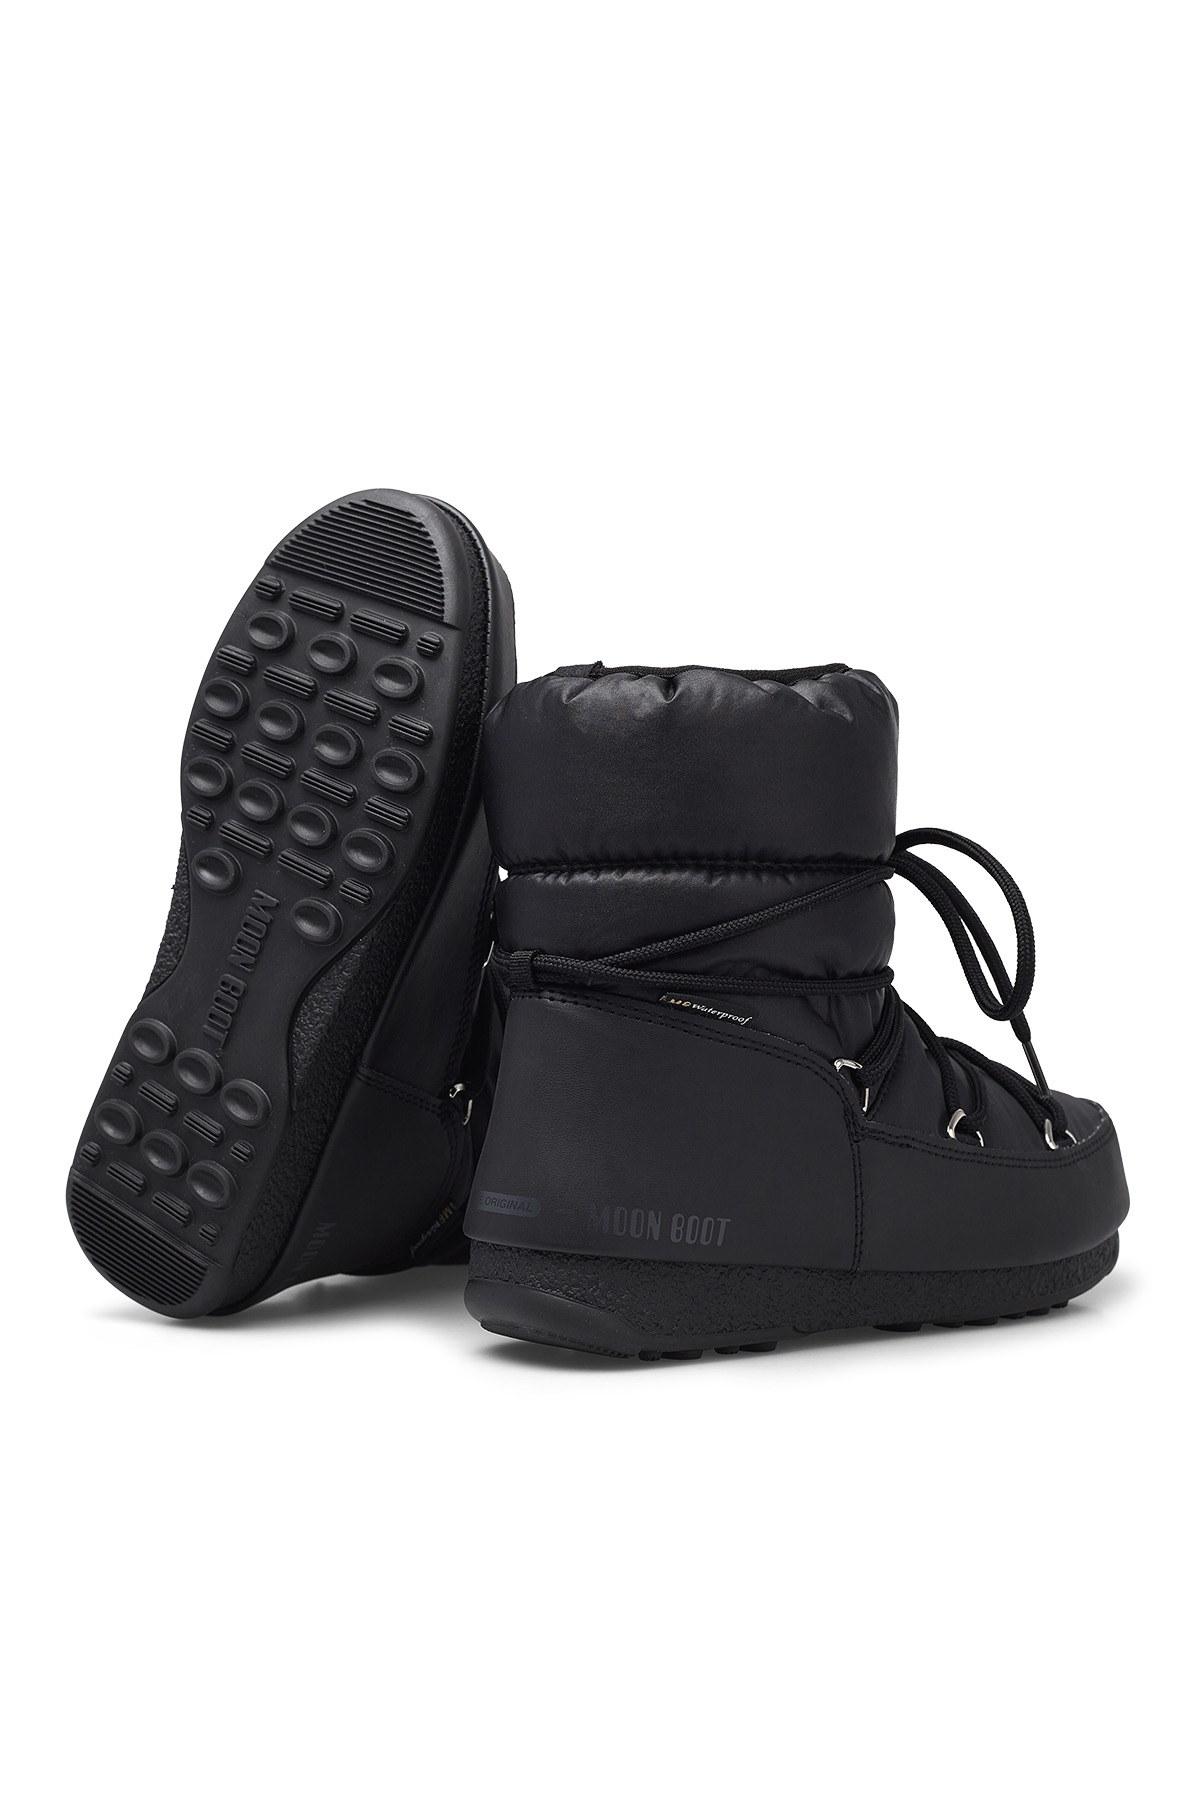 Moon Boot Kadın Kar Botu 24009300 001 SİYAH